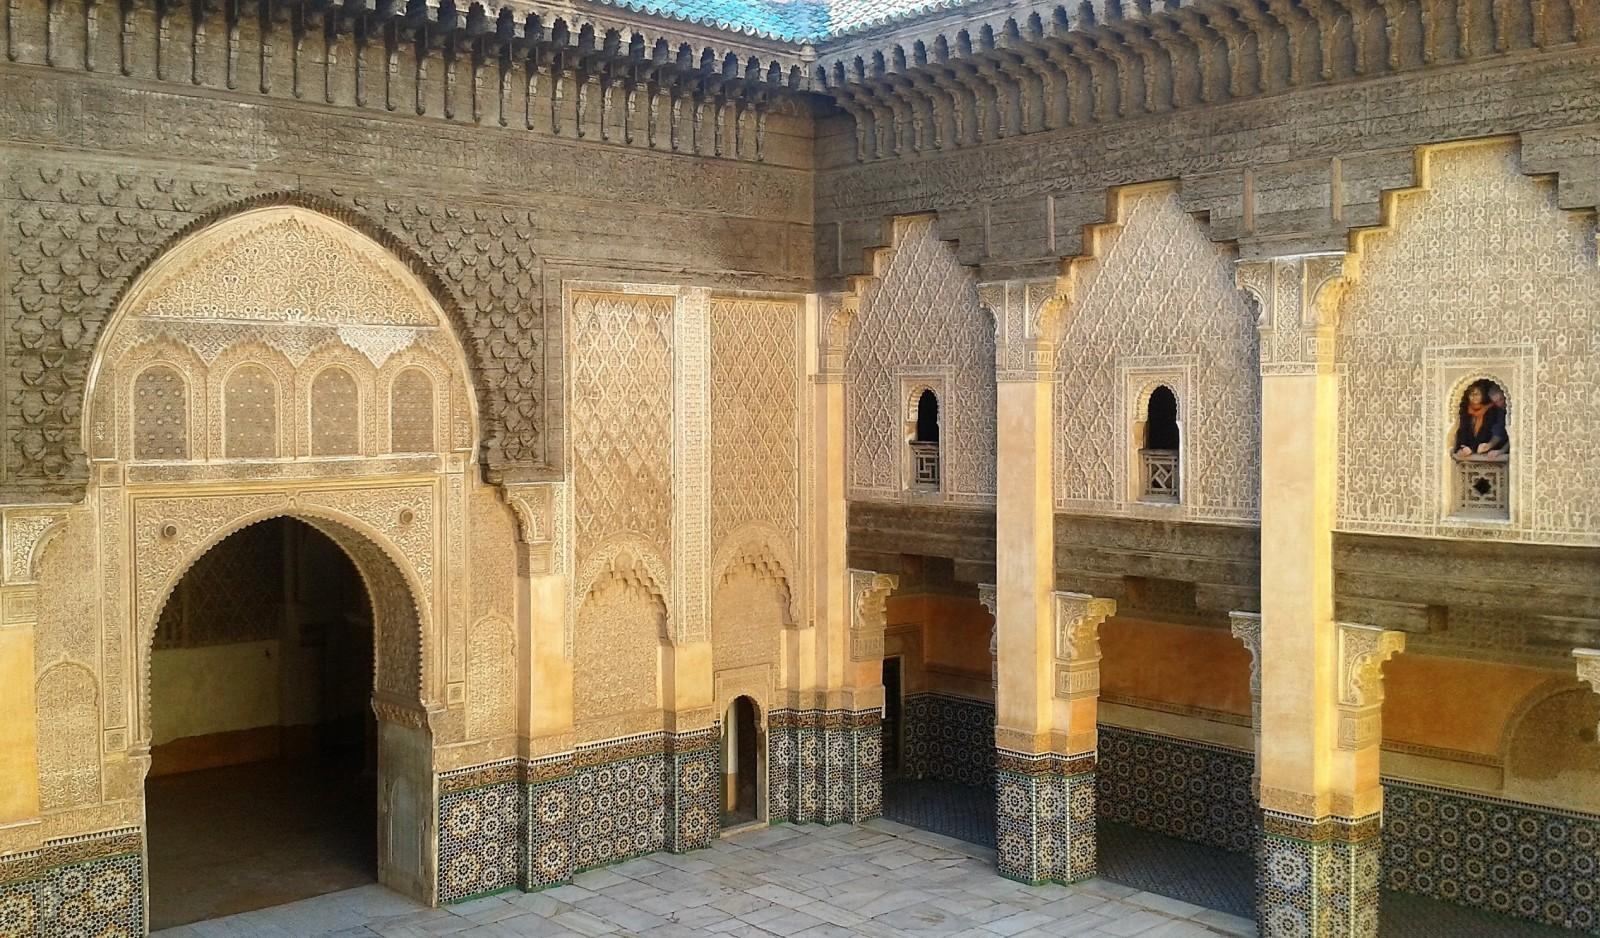 palaces in Marrakech: Medersa Ali Ben Youssef Marrakech